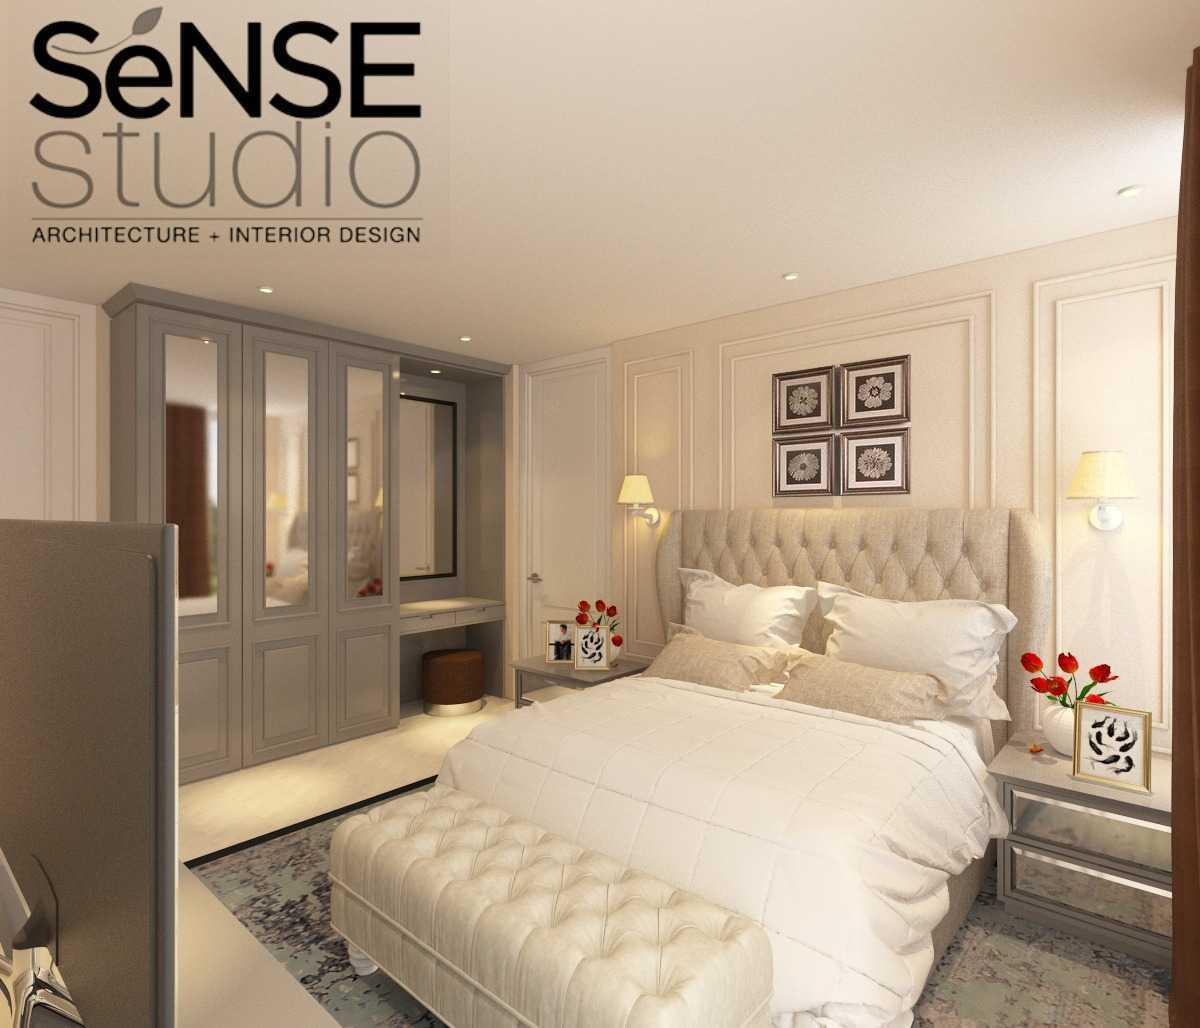 Sense Isle Studio Residence Surabaya Surabaya, Kota Sby, Jawa Timur, Indonesia Surabaya, Kota Sby, Jawa Timur, Indonesia Sense-Studio-Residence-Surabaya  80439